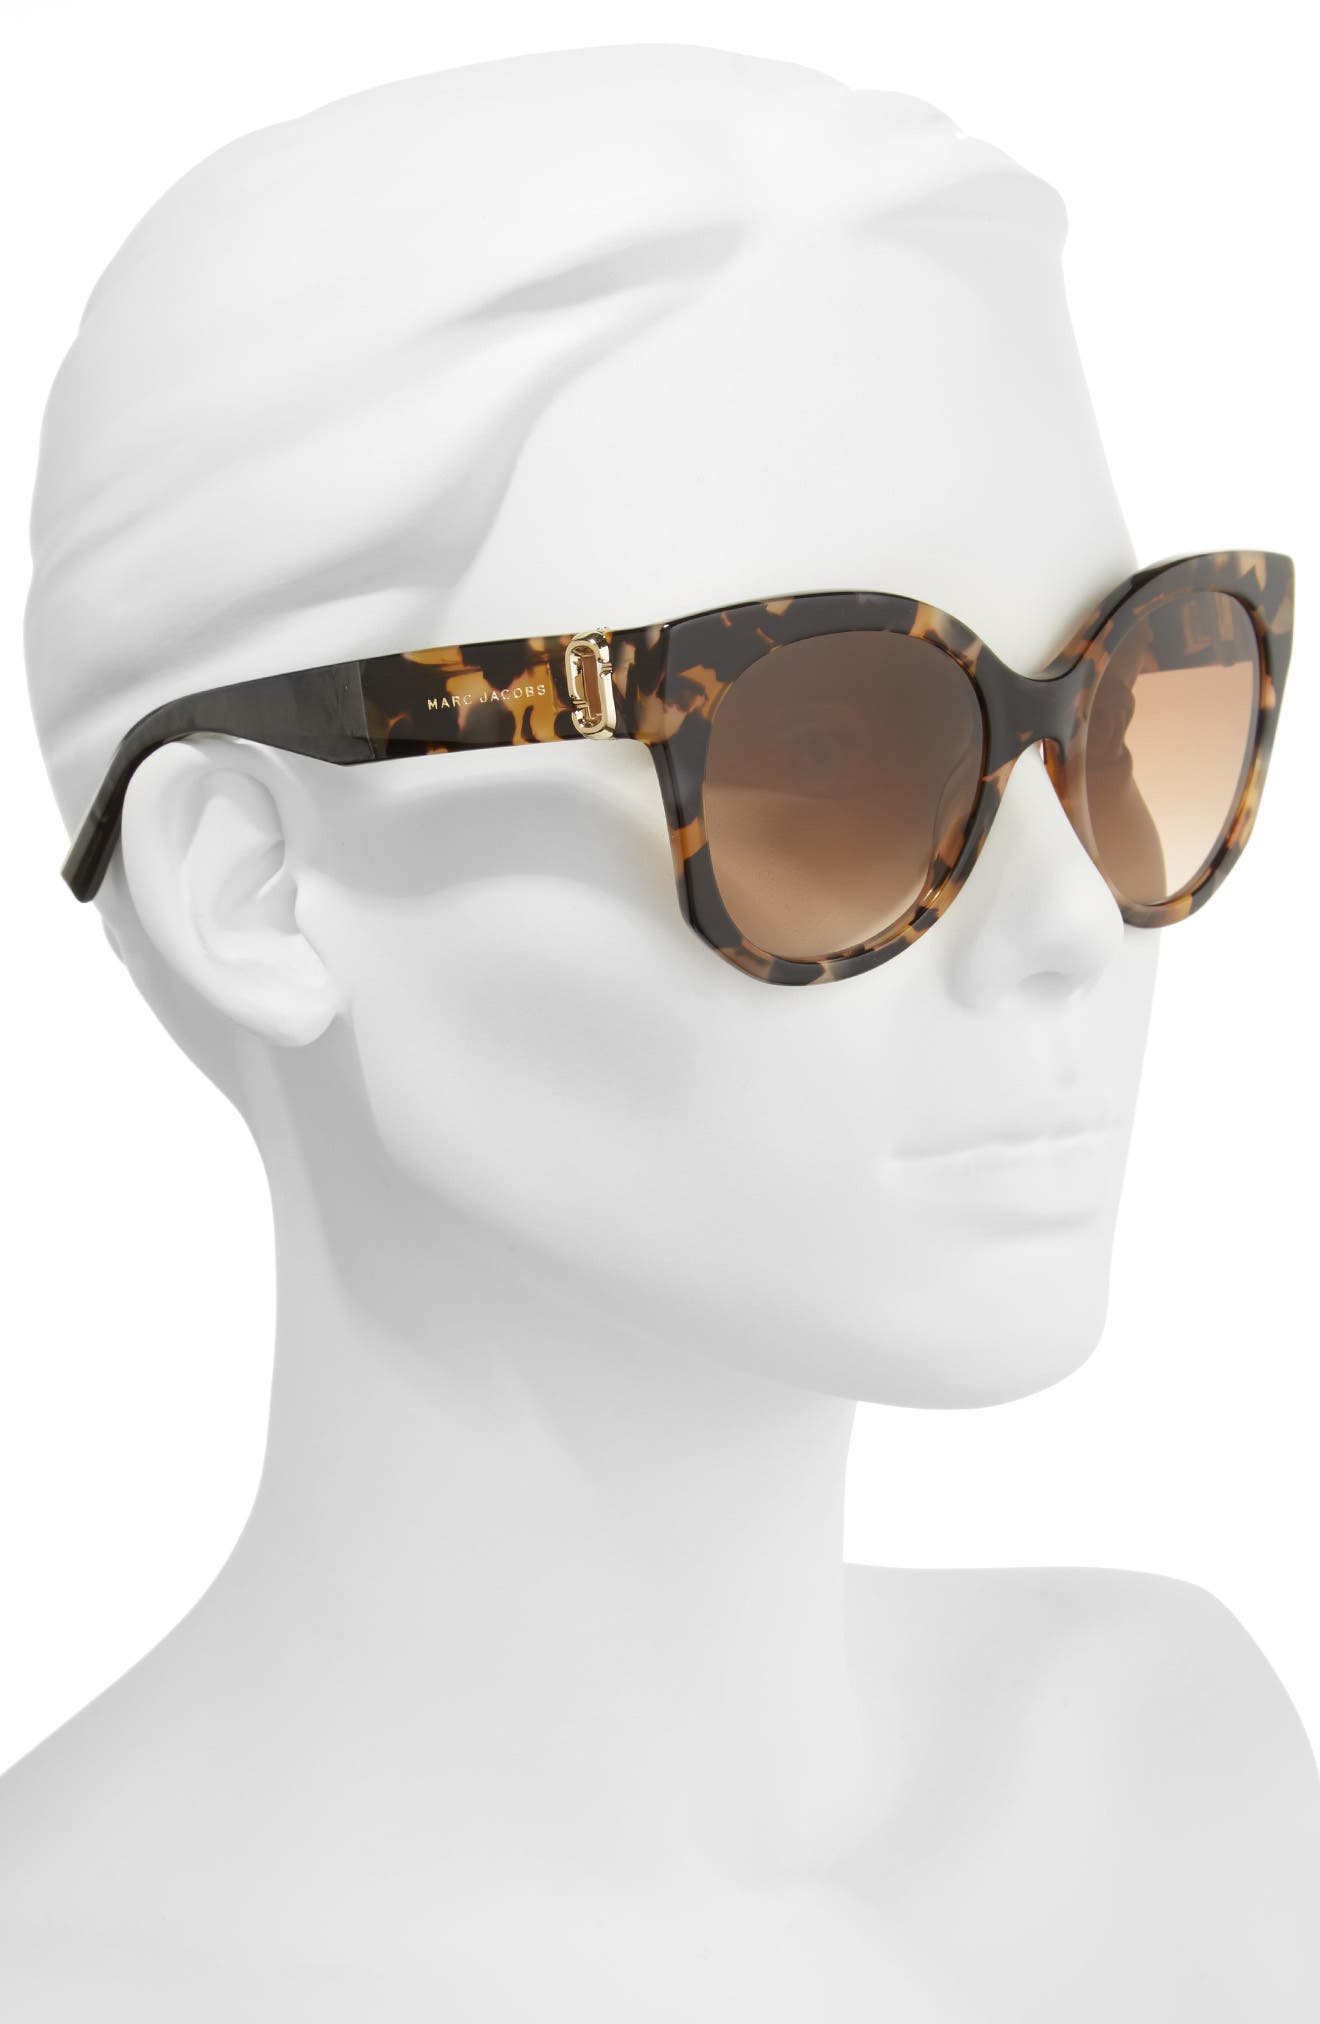 53mm Gradient Lens Cat Eye Sunglasses,                             Alternate thumbnail 2, color,                             Dark Havanna